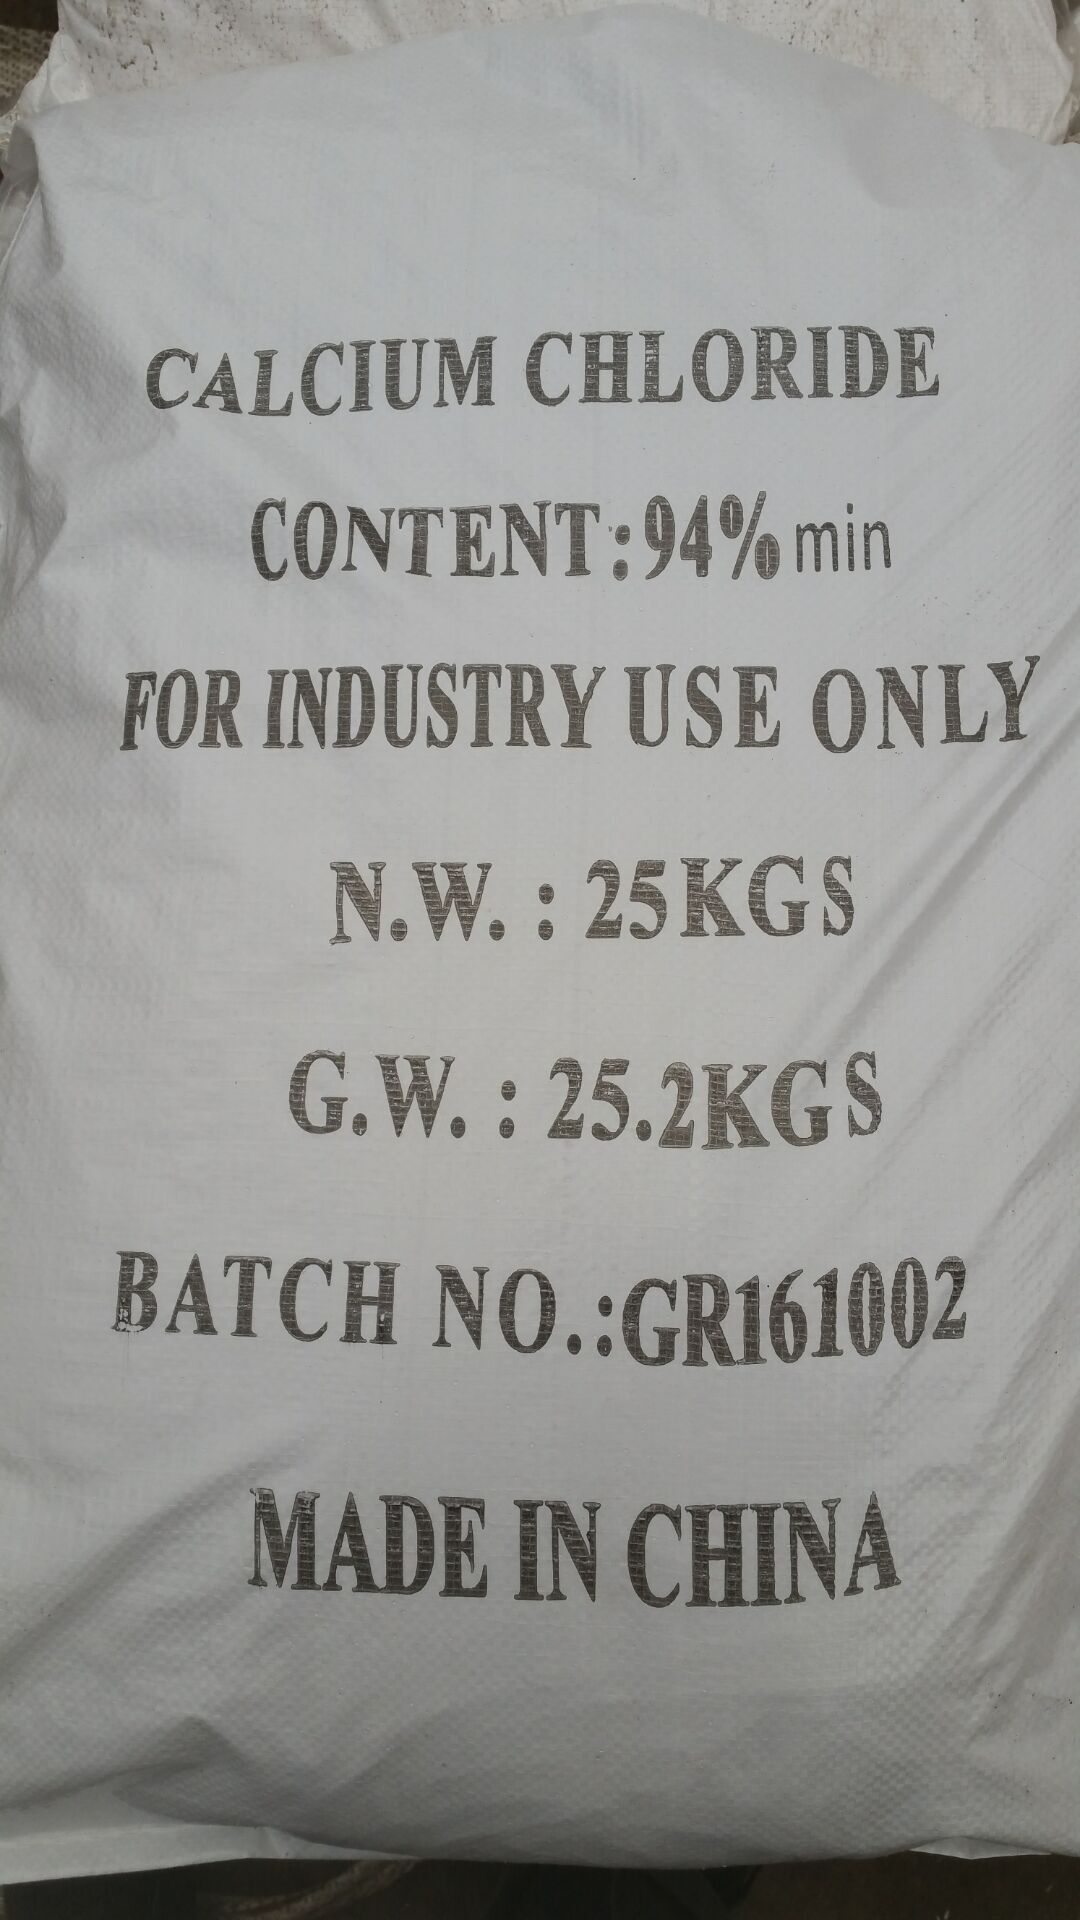 Calcium chloride   Canxi clorua   CaCl2